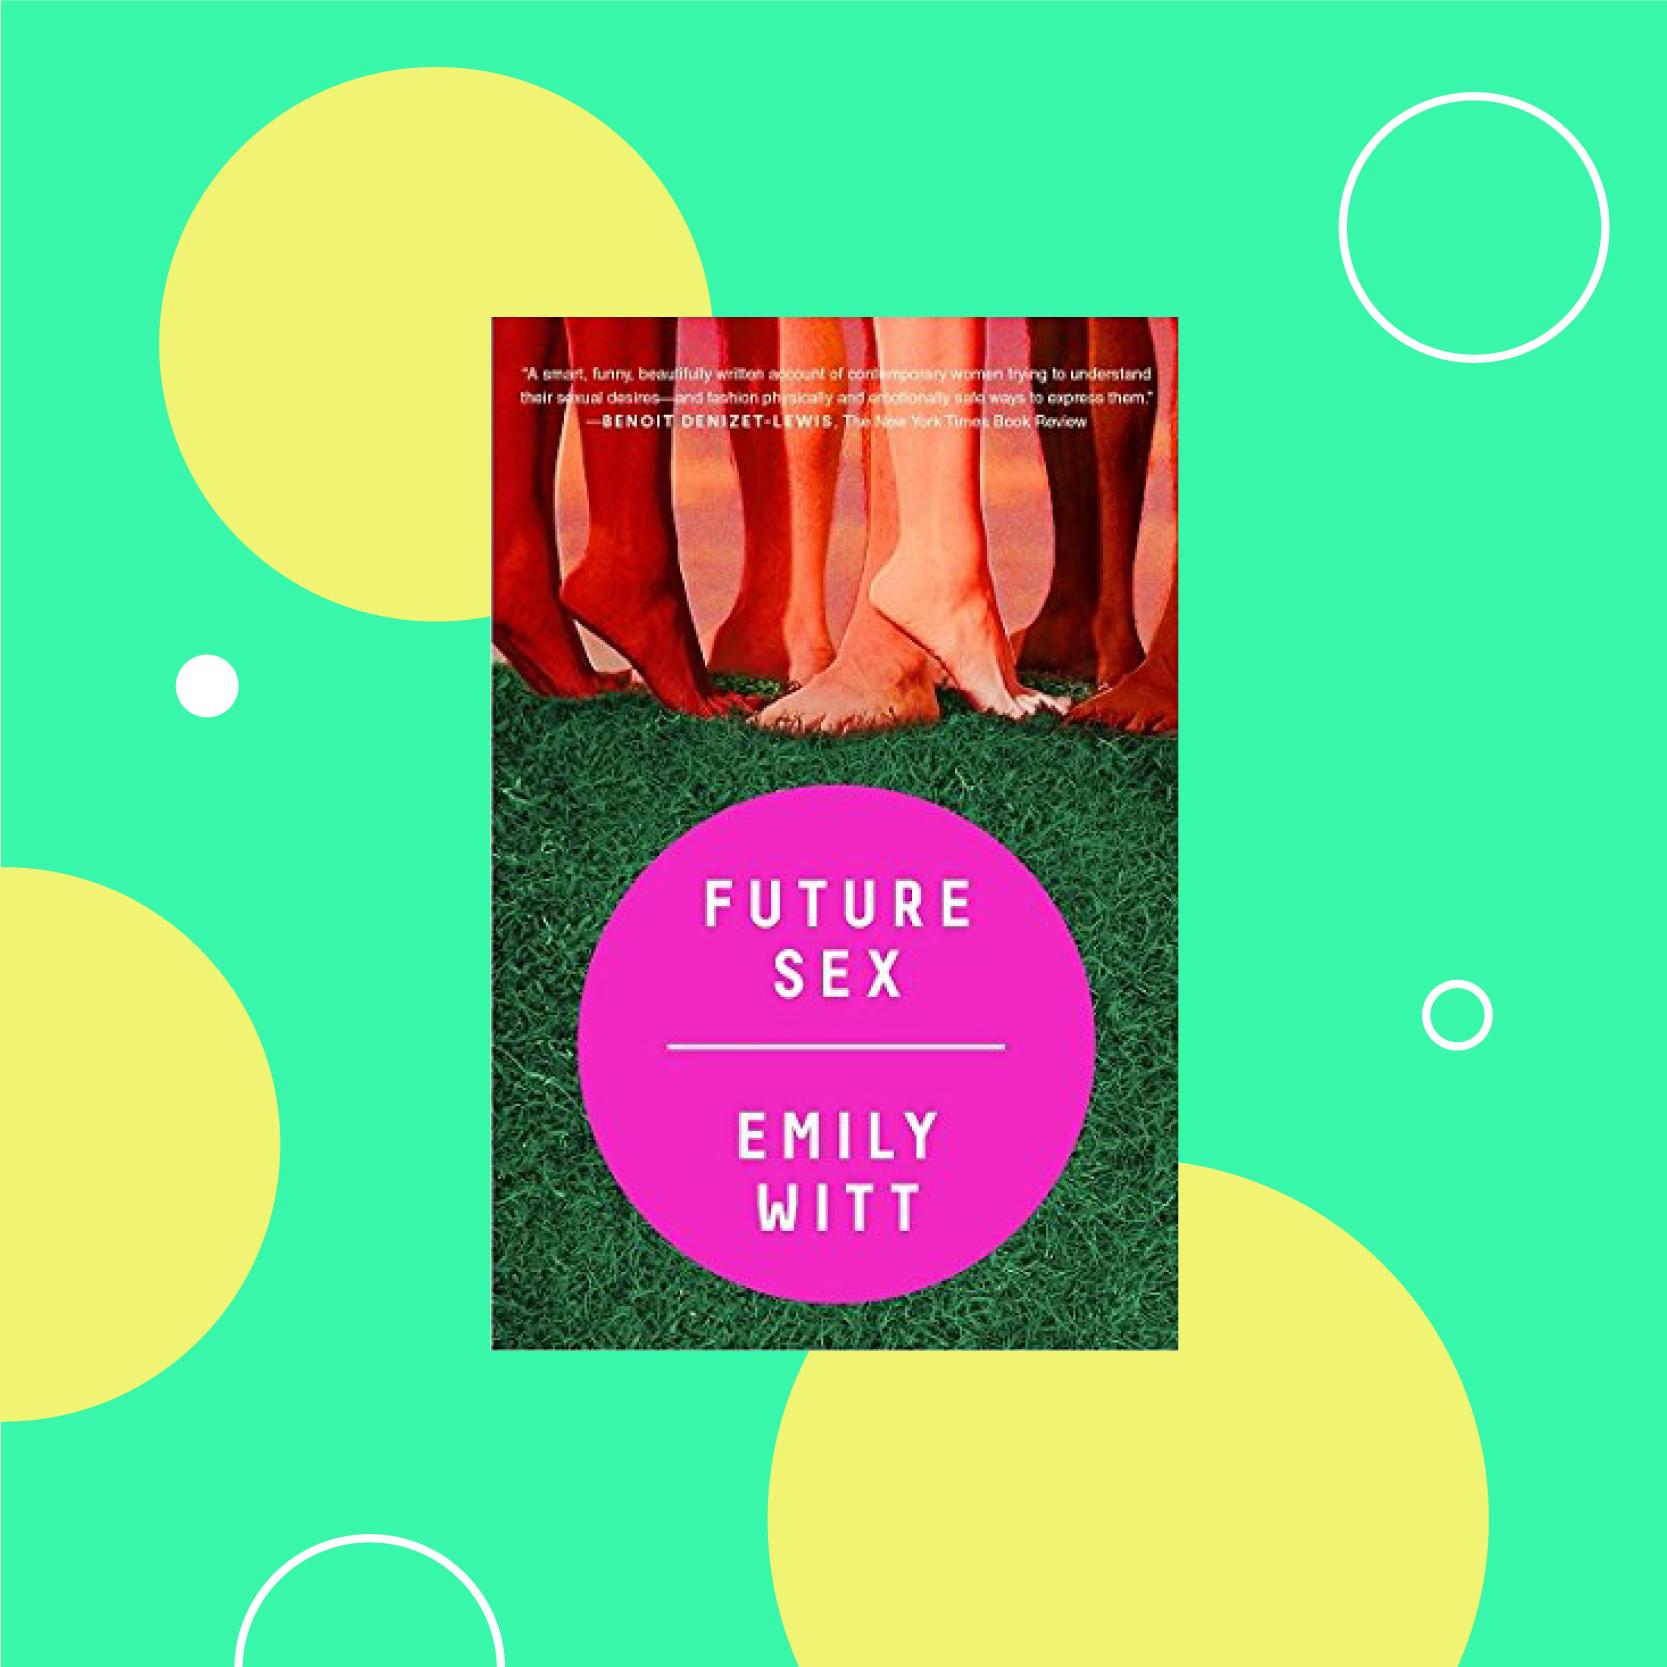 Future-Sex-Emily-Witt.jpg